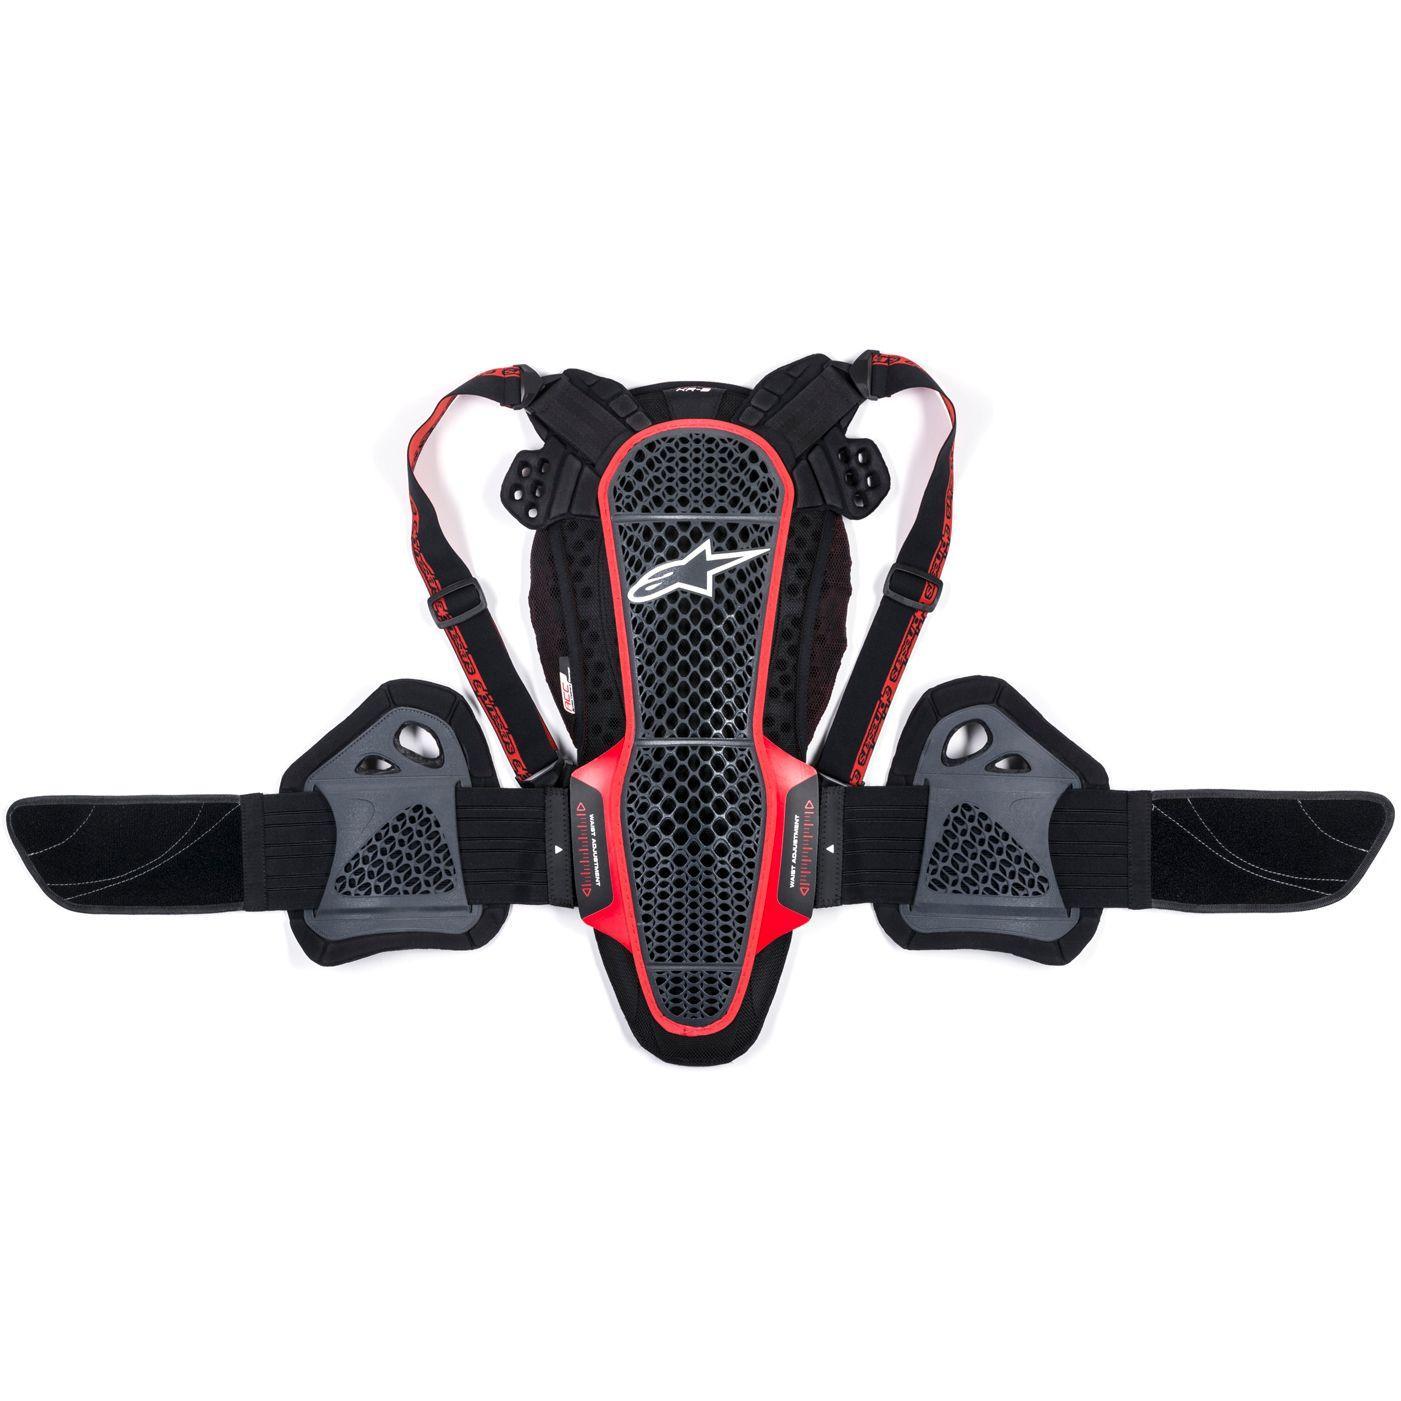 PARASCHIENA MOTO ALPINESTARS NUCLEON KR-3 SMOKE BLACK RED